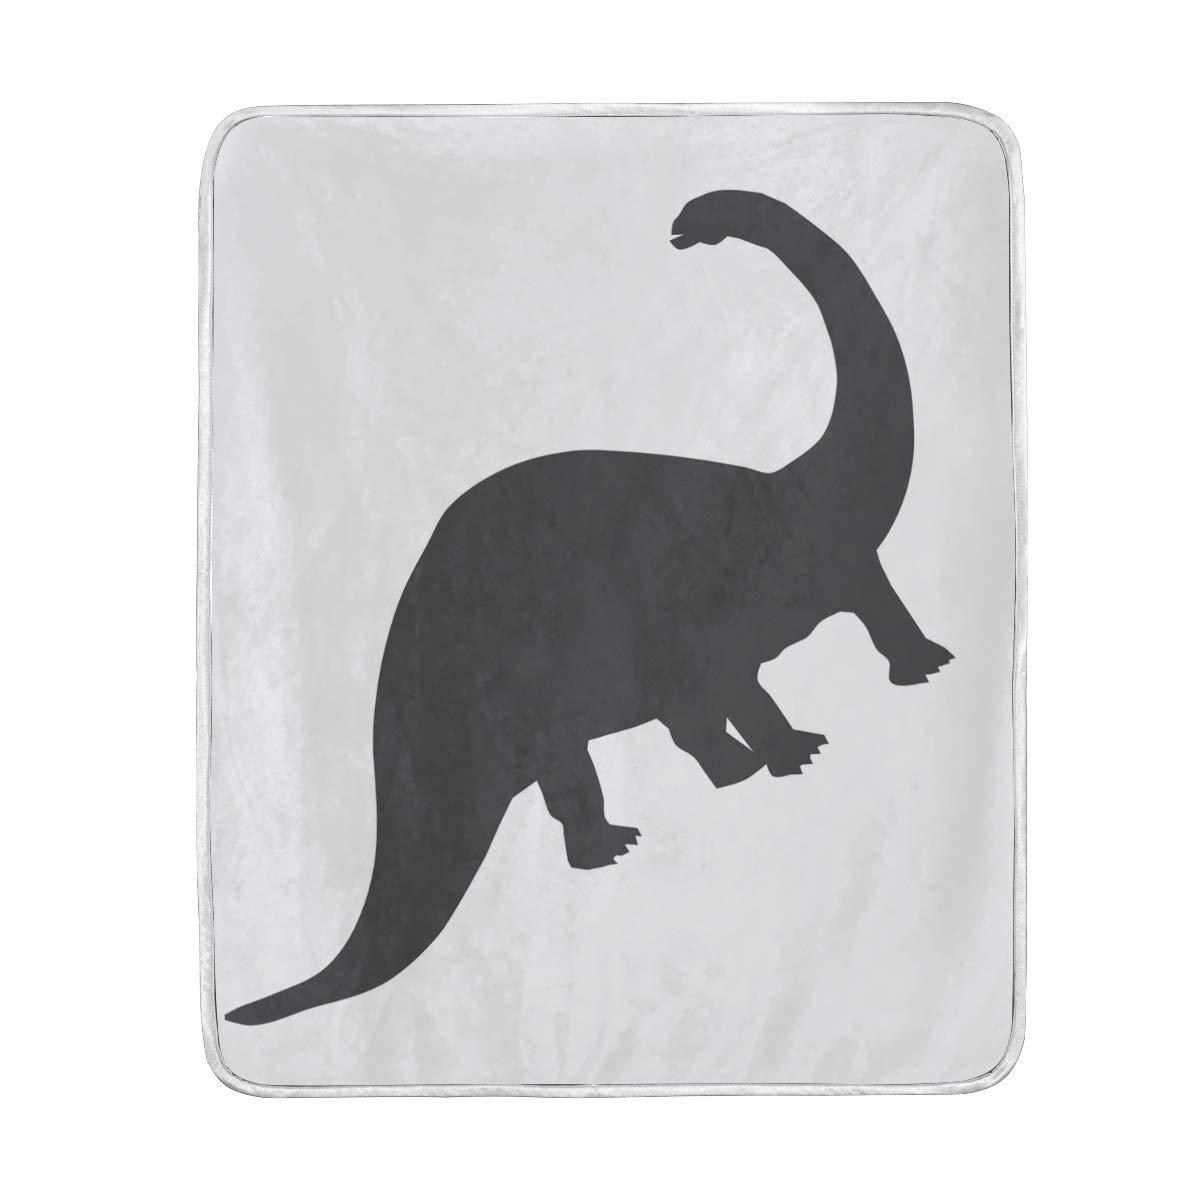 875b8ea5b763 Amazon.com: Lilibeely Ultra Soft Microplush Velvet Dinosaur Pattern ...